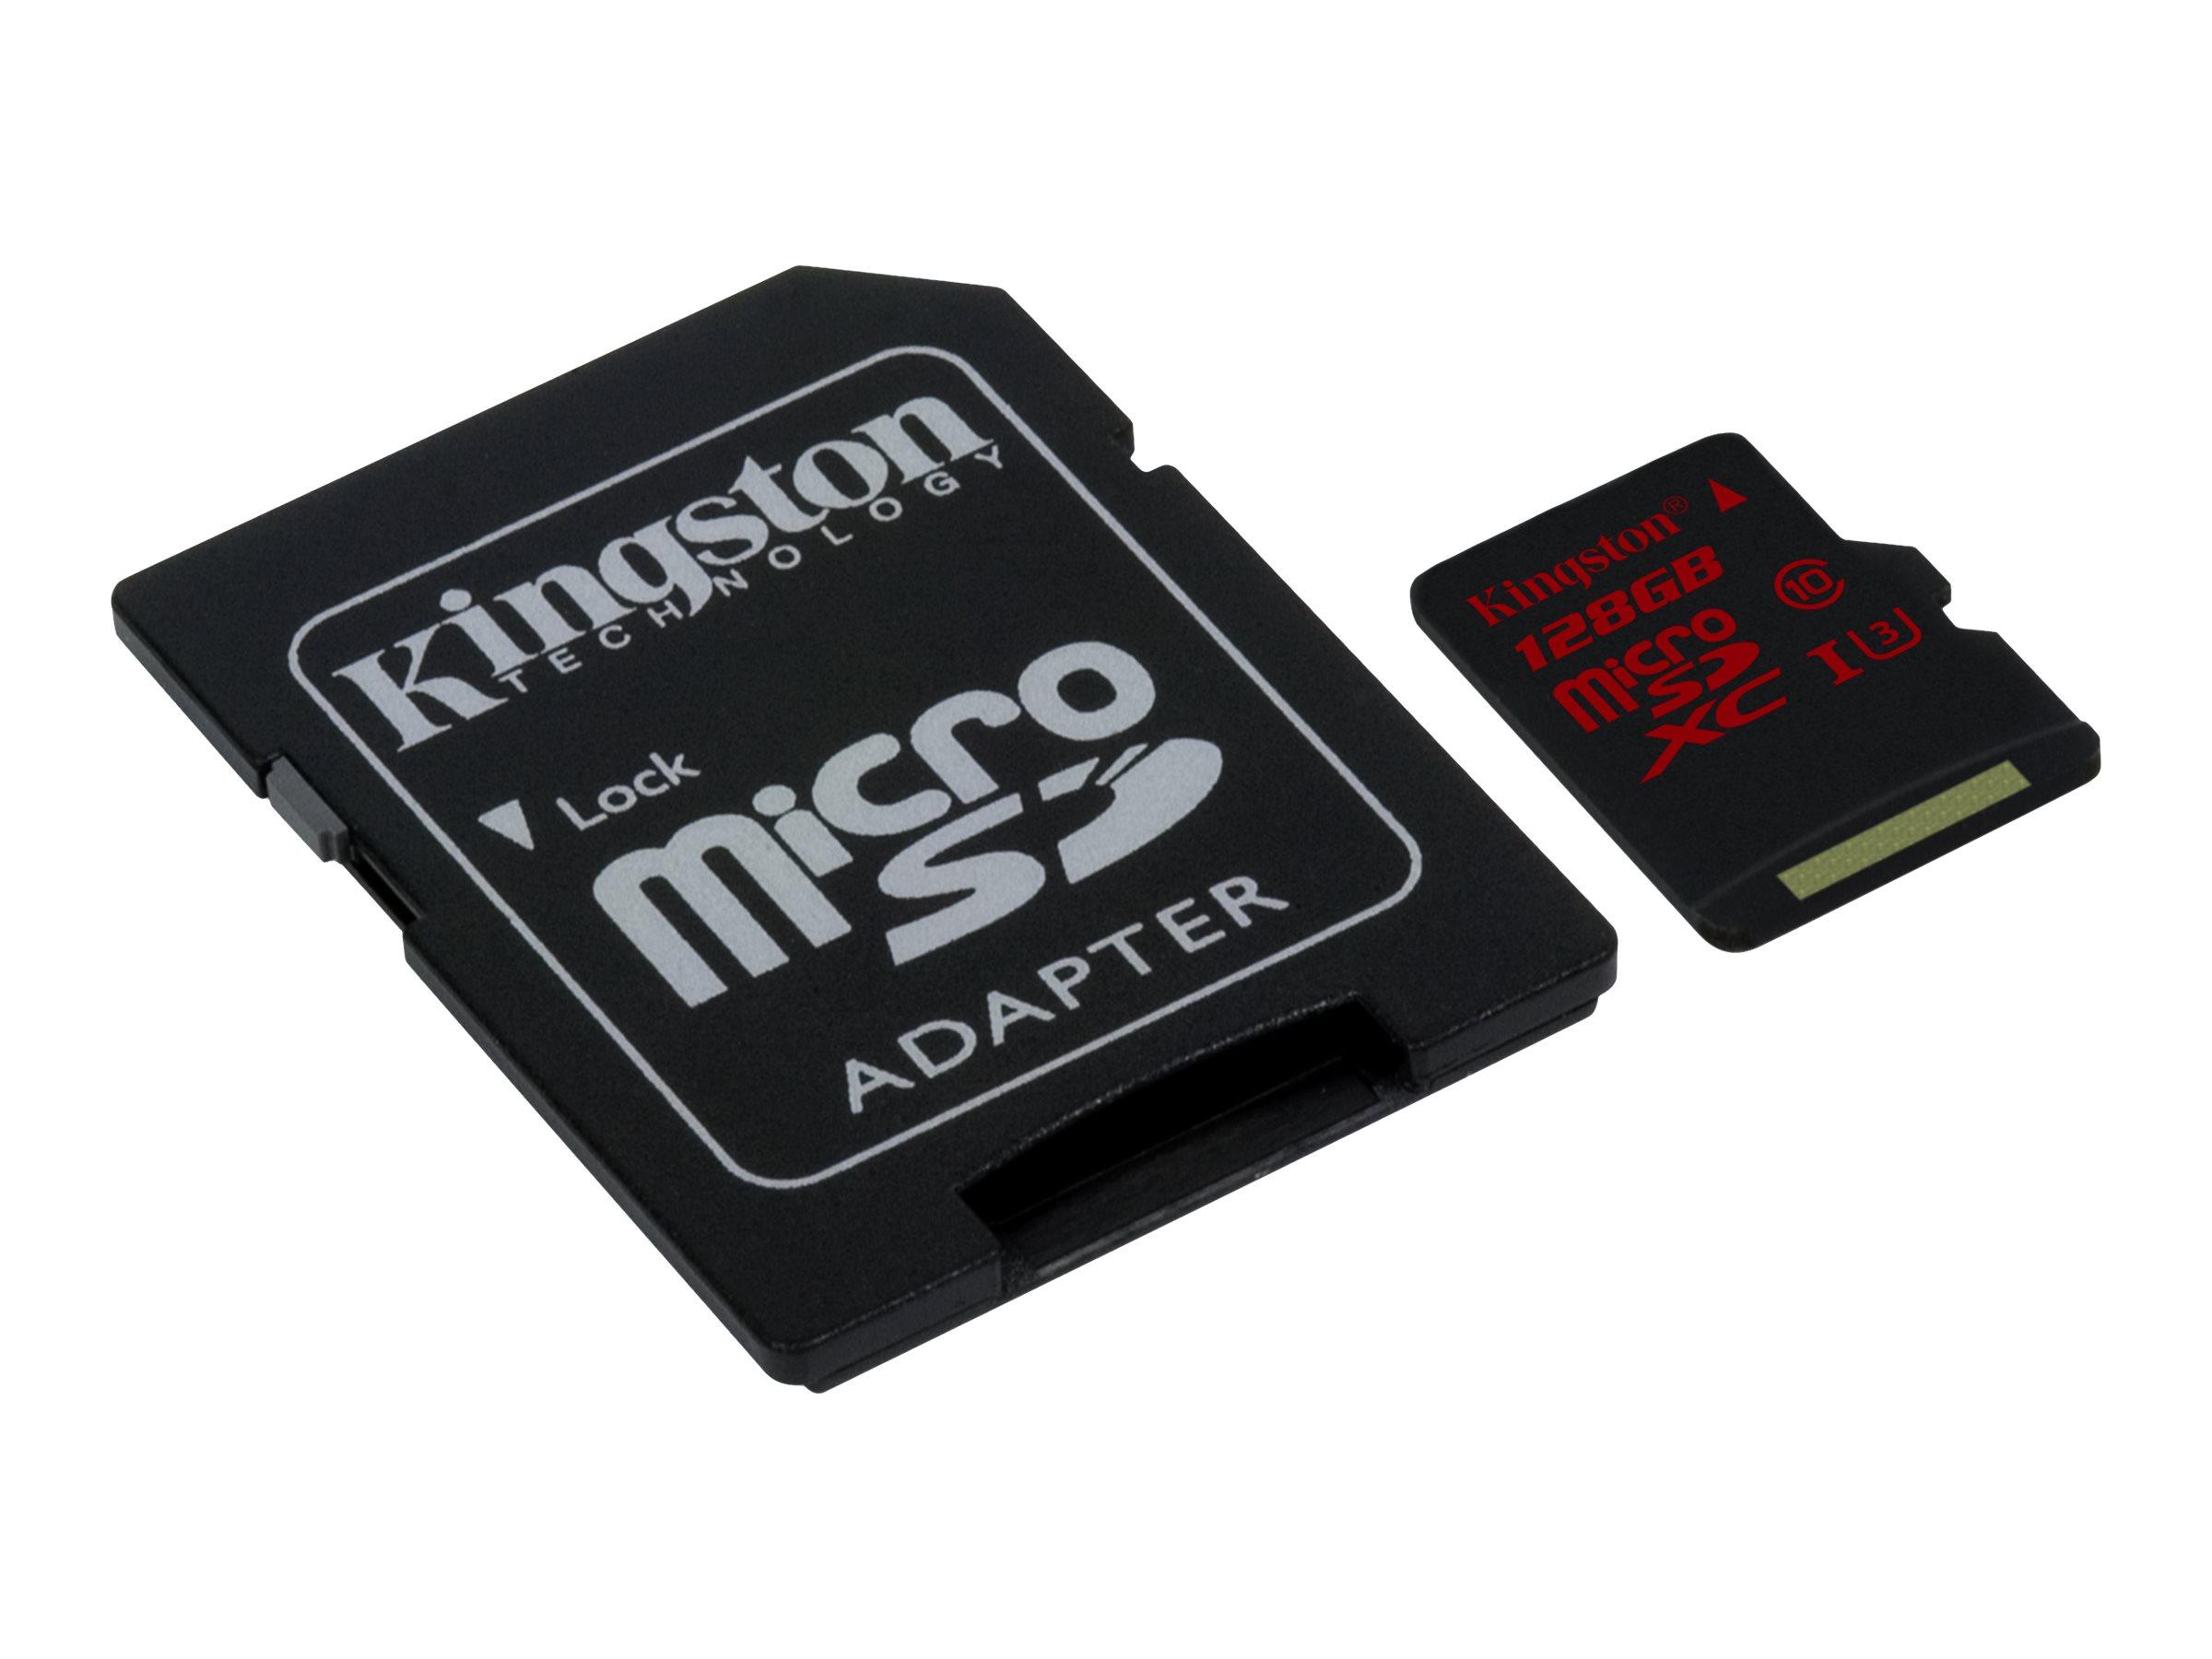 Kingston - Flash-Speicherkarte (microSDXC-an-SD-Adapter inbegriffen) - 128 GB - UHS Class 3 - microSDXC UHS-I